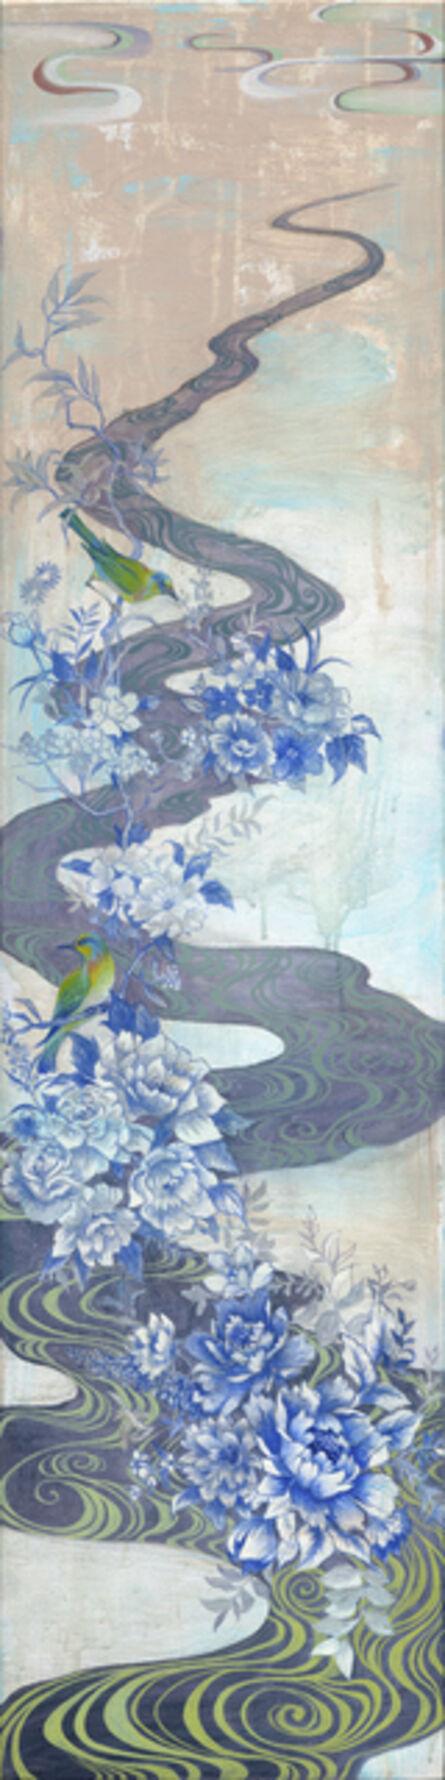 Pei-Cheng Hsu 許旆誠, '逝水茹花', 2020